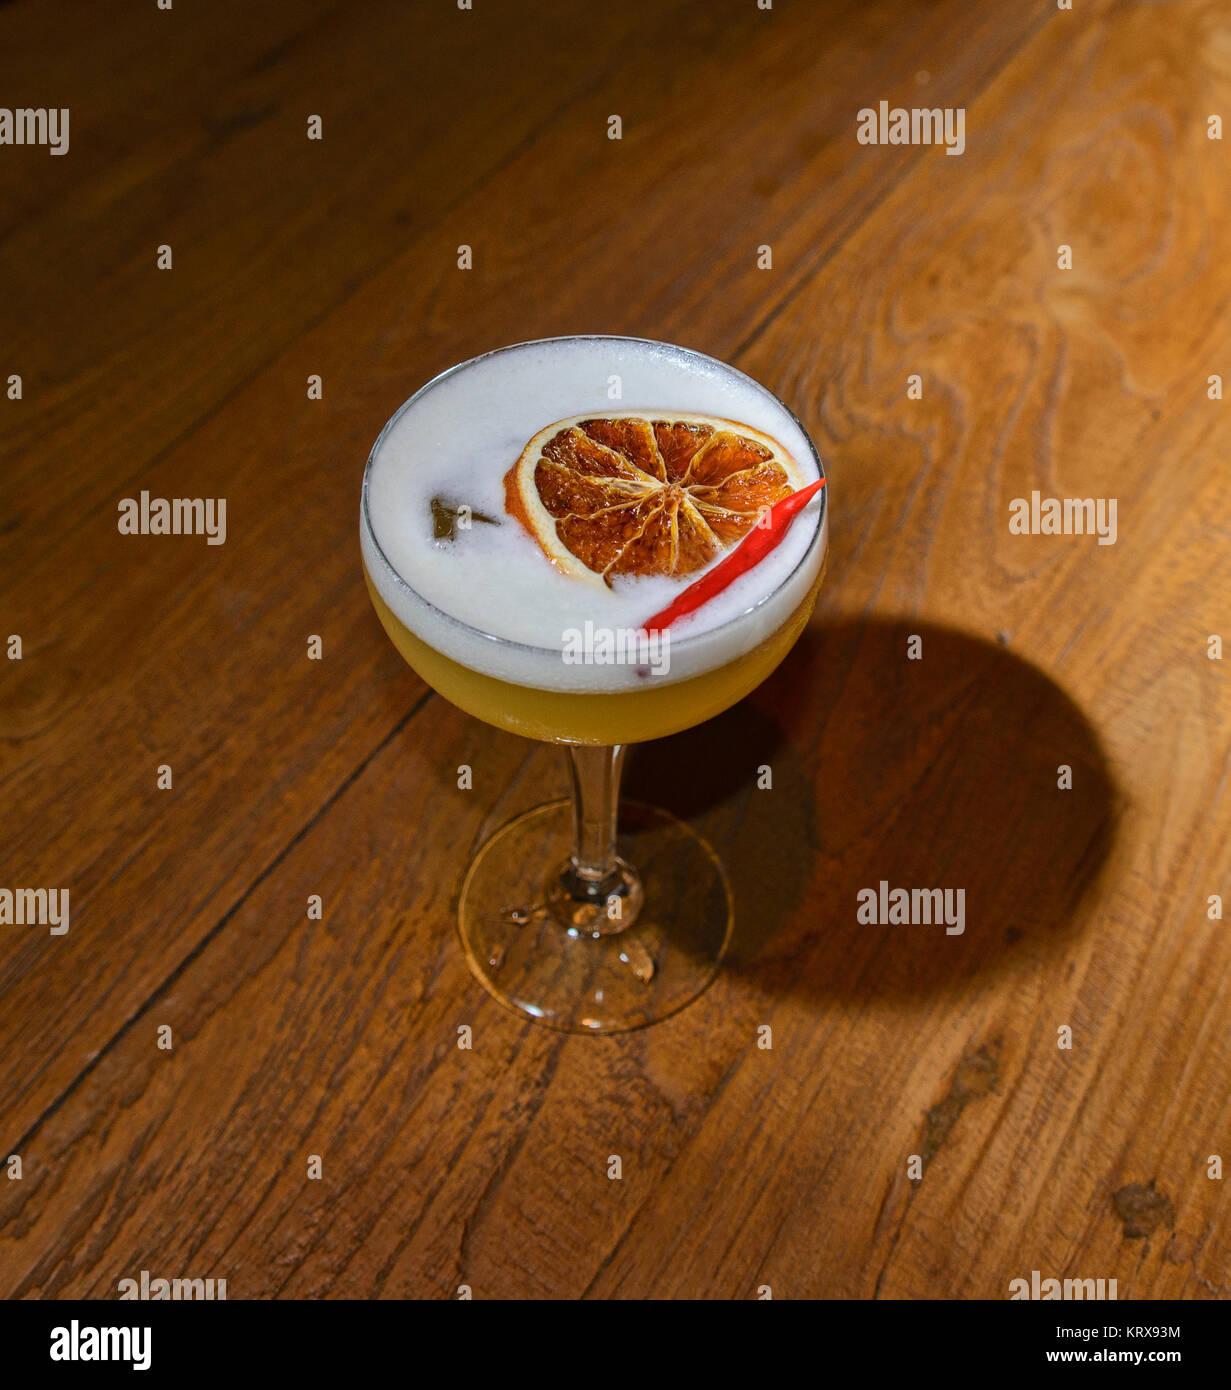 Spicy cocktail at a bar in Bangkok, Thailand - Stock Image